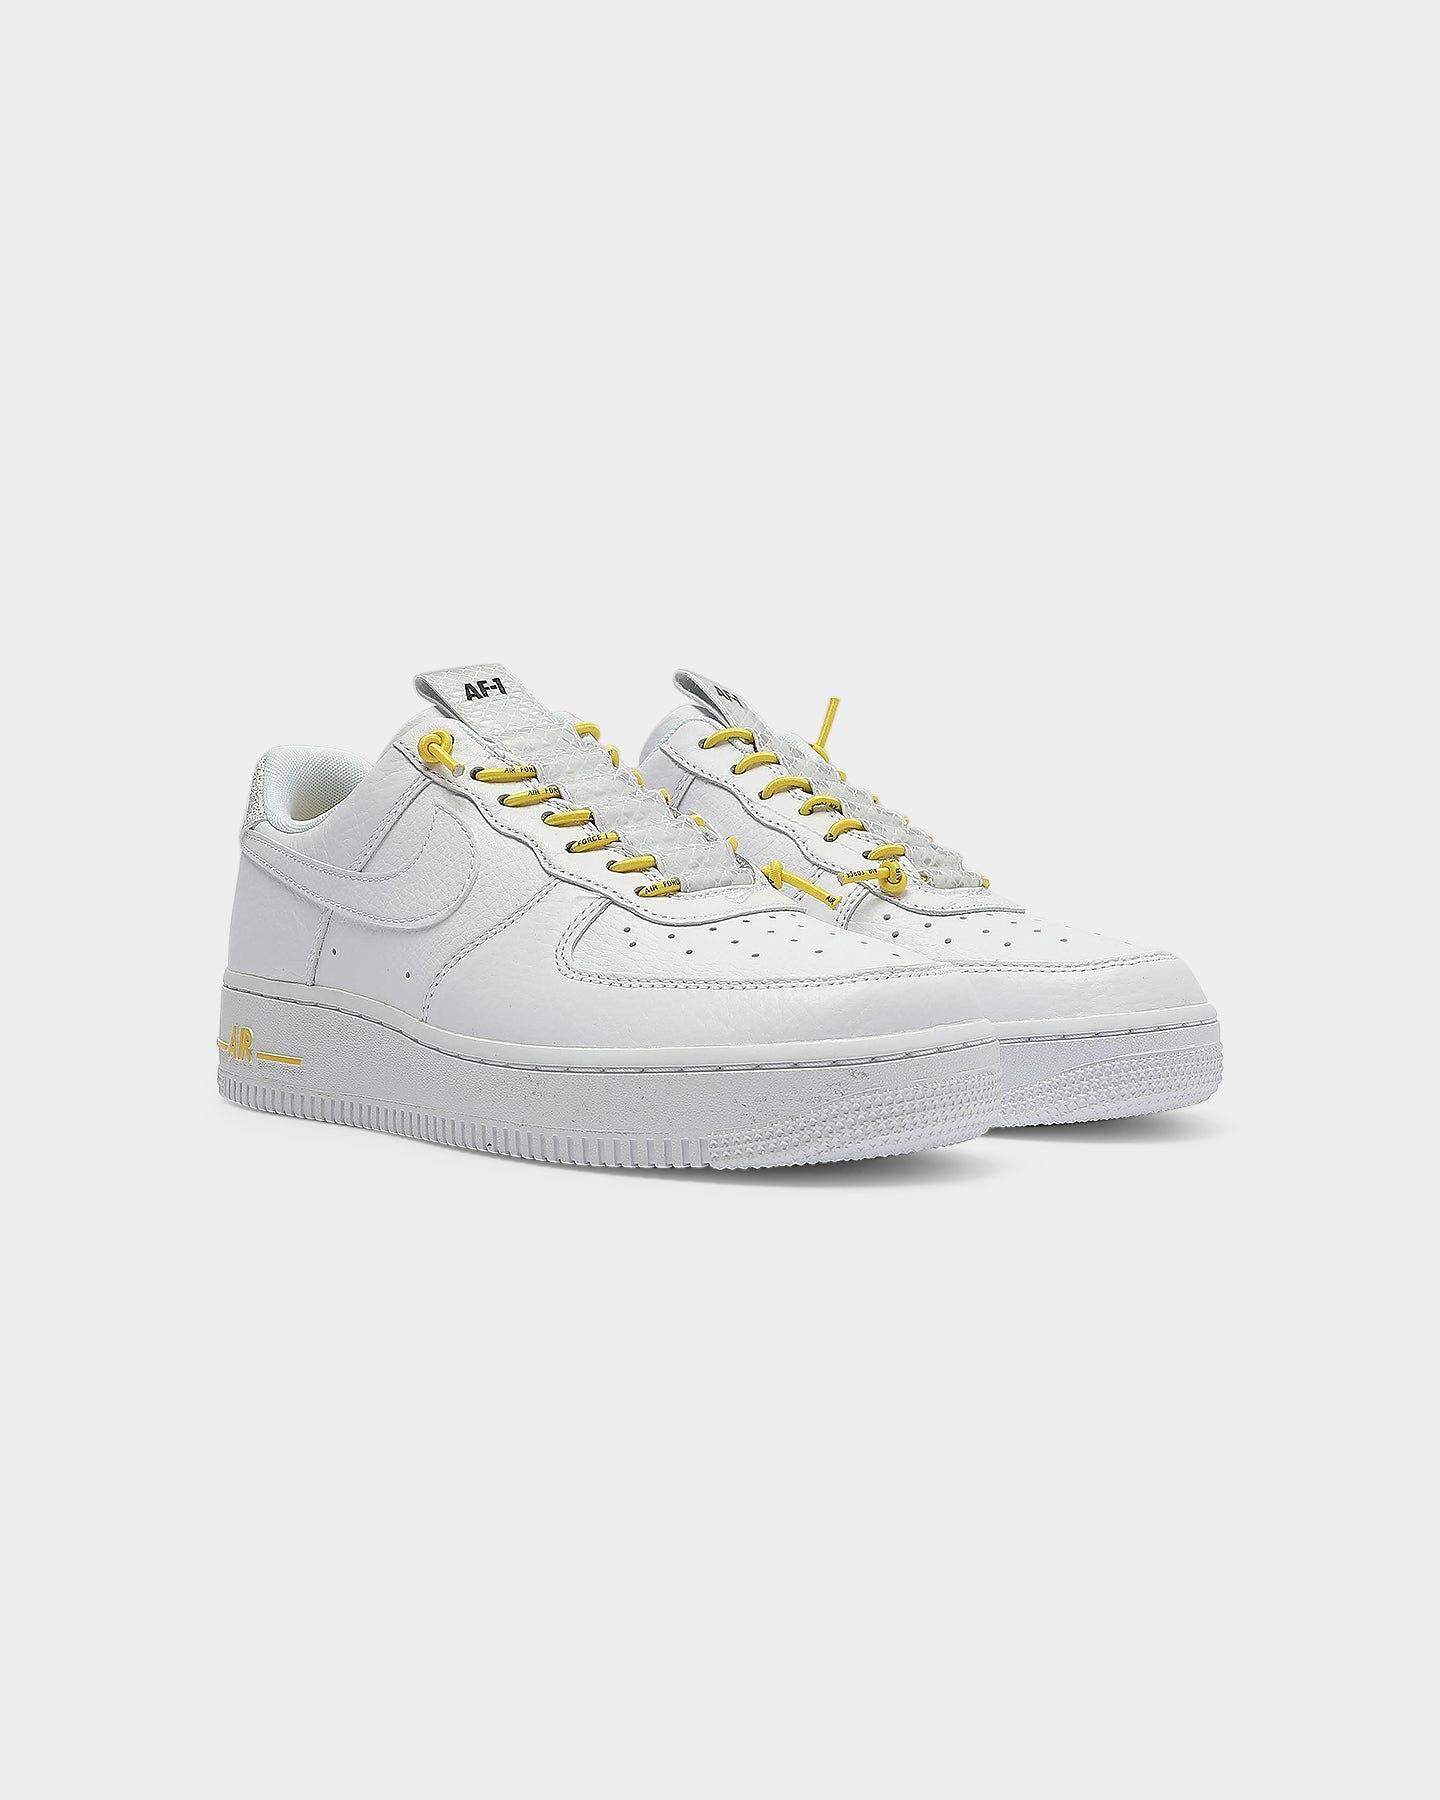 Nike Women's Air Force 1 '07 LUX White/Yellow//Black